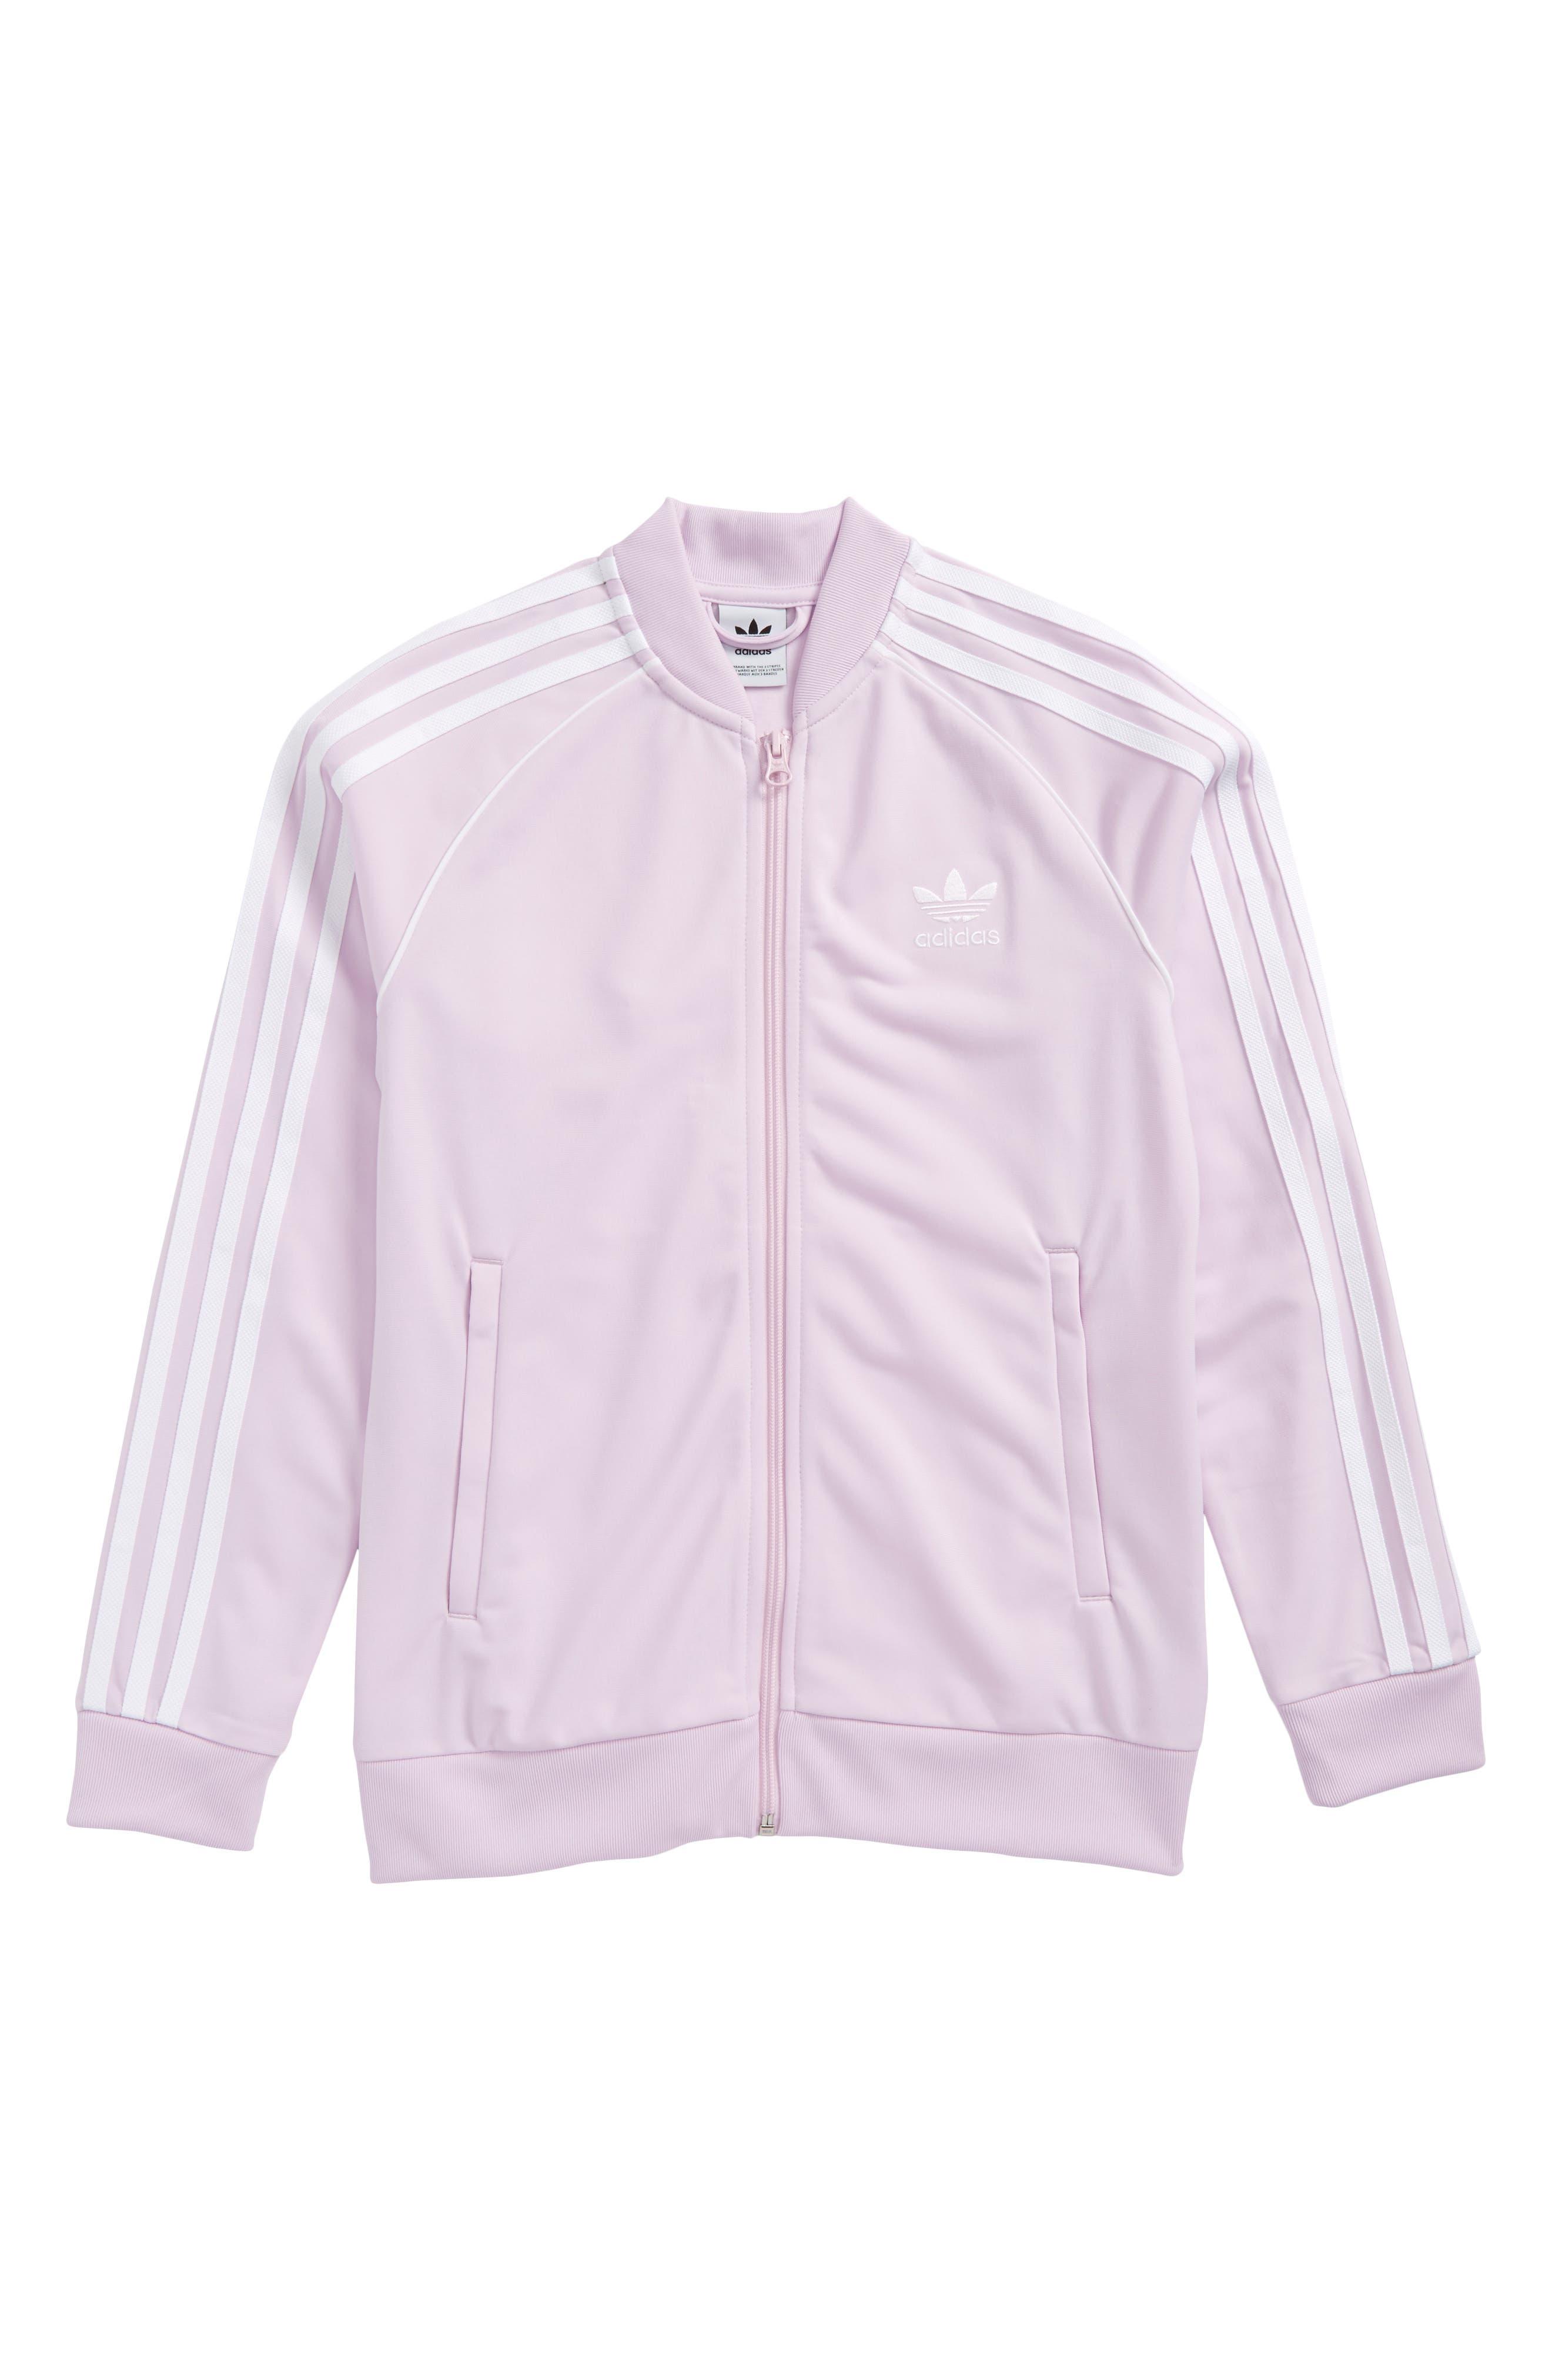 adidas SST Track Jacket,                         Main,                         color, 682